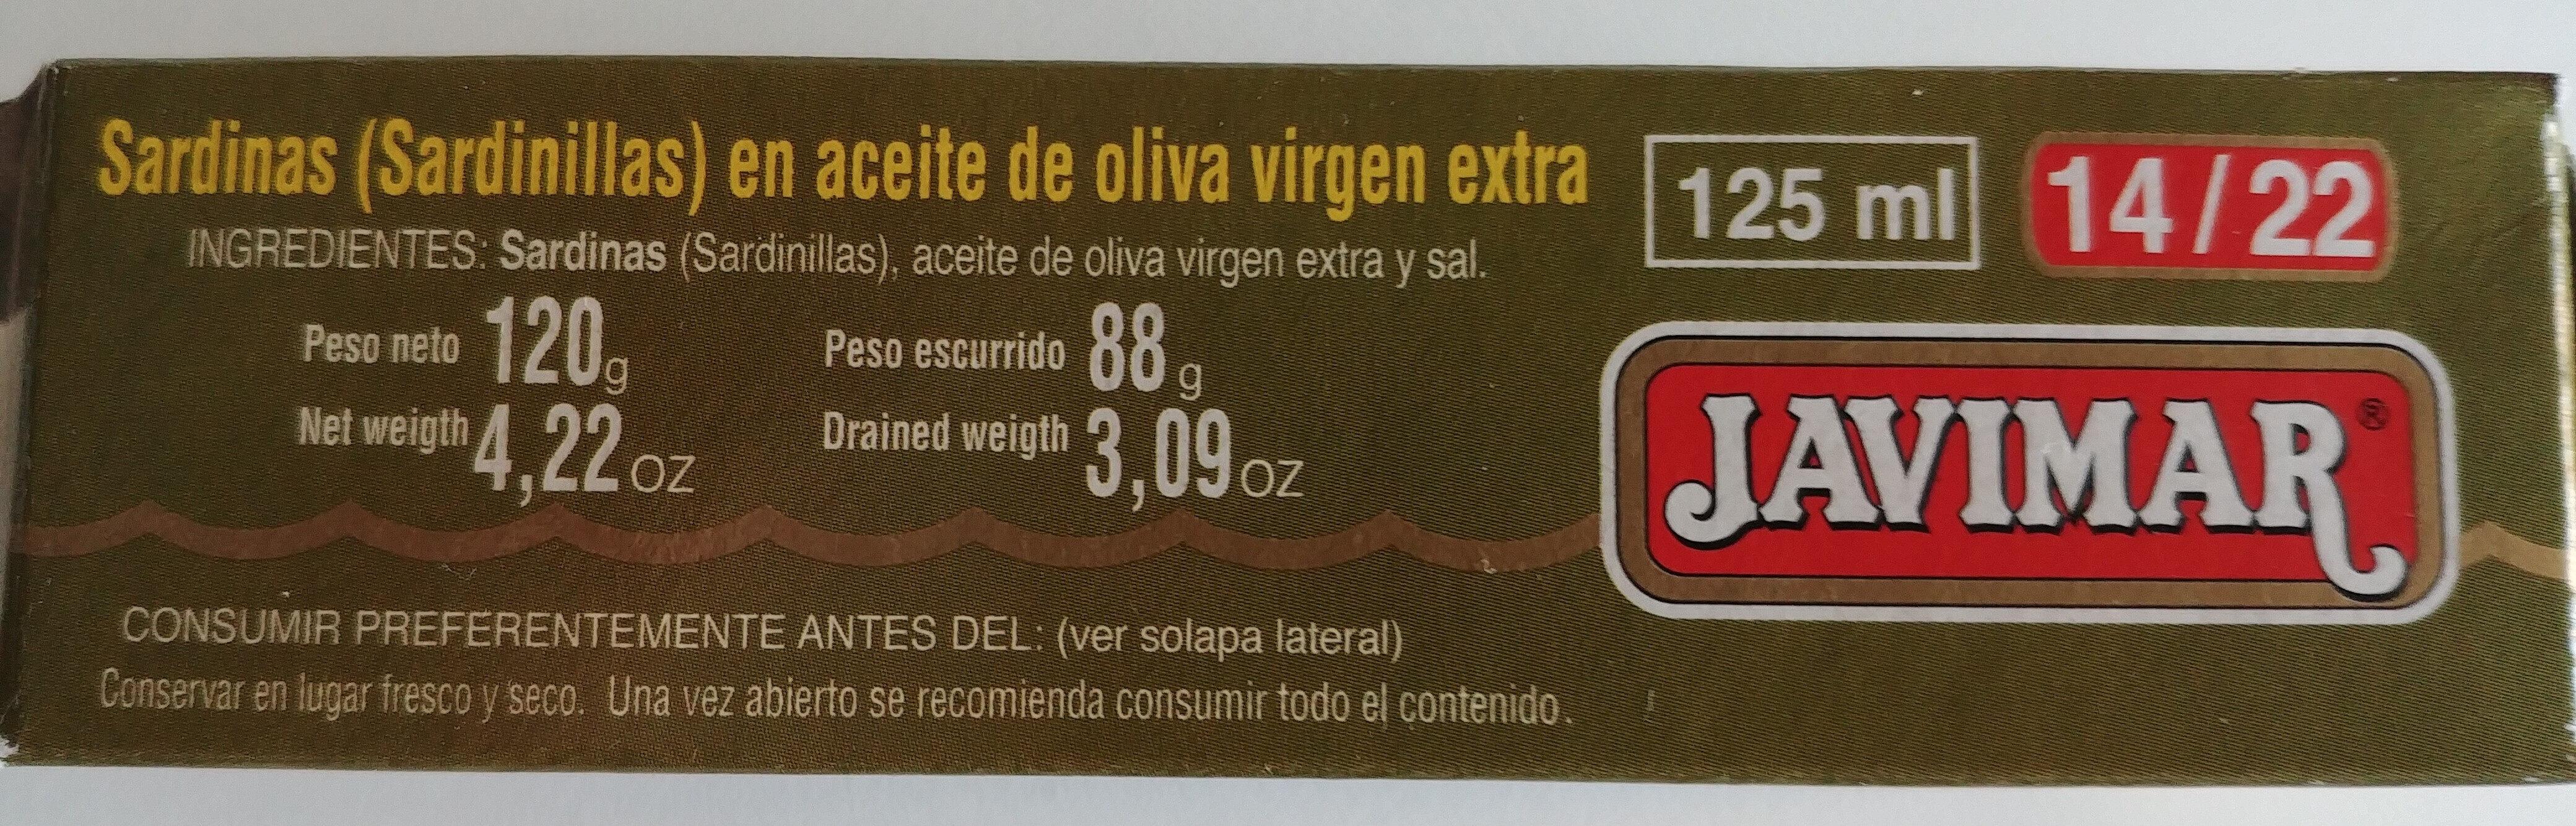 Sardinillas en aceite de oliva virgen extra - Ingredients